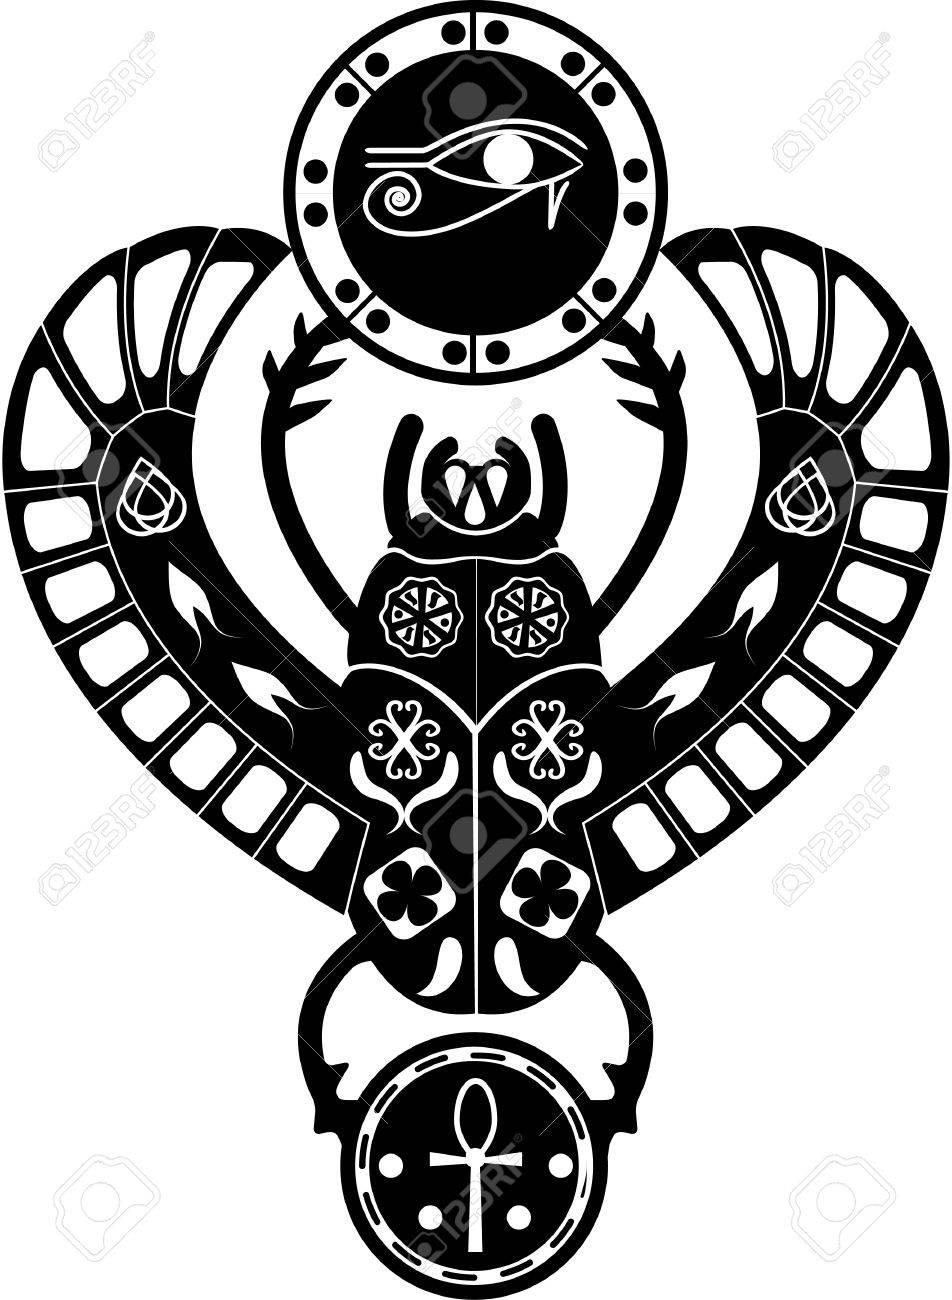 952x1300 Black And White Silueit Ancient Egyptian Symbol, Amulet